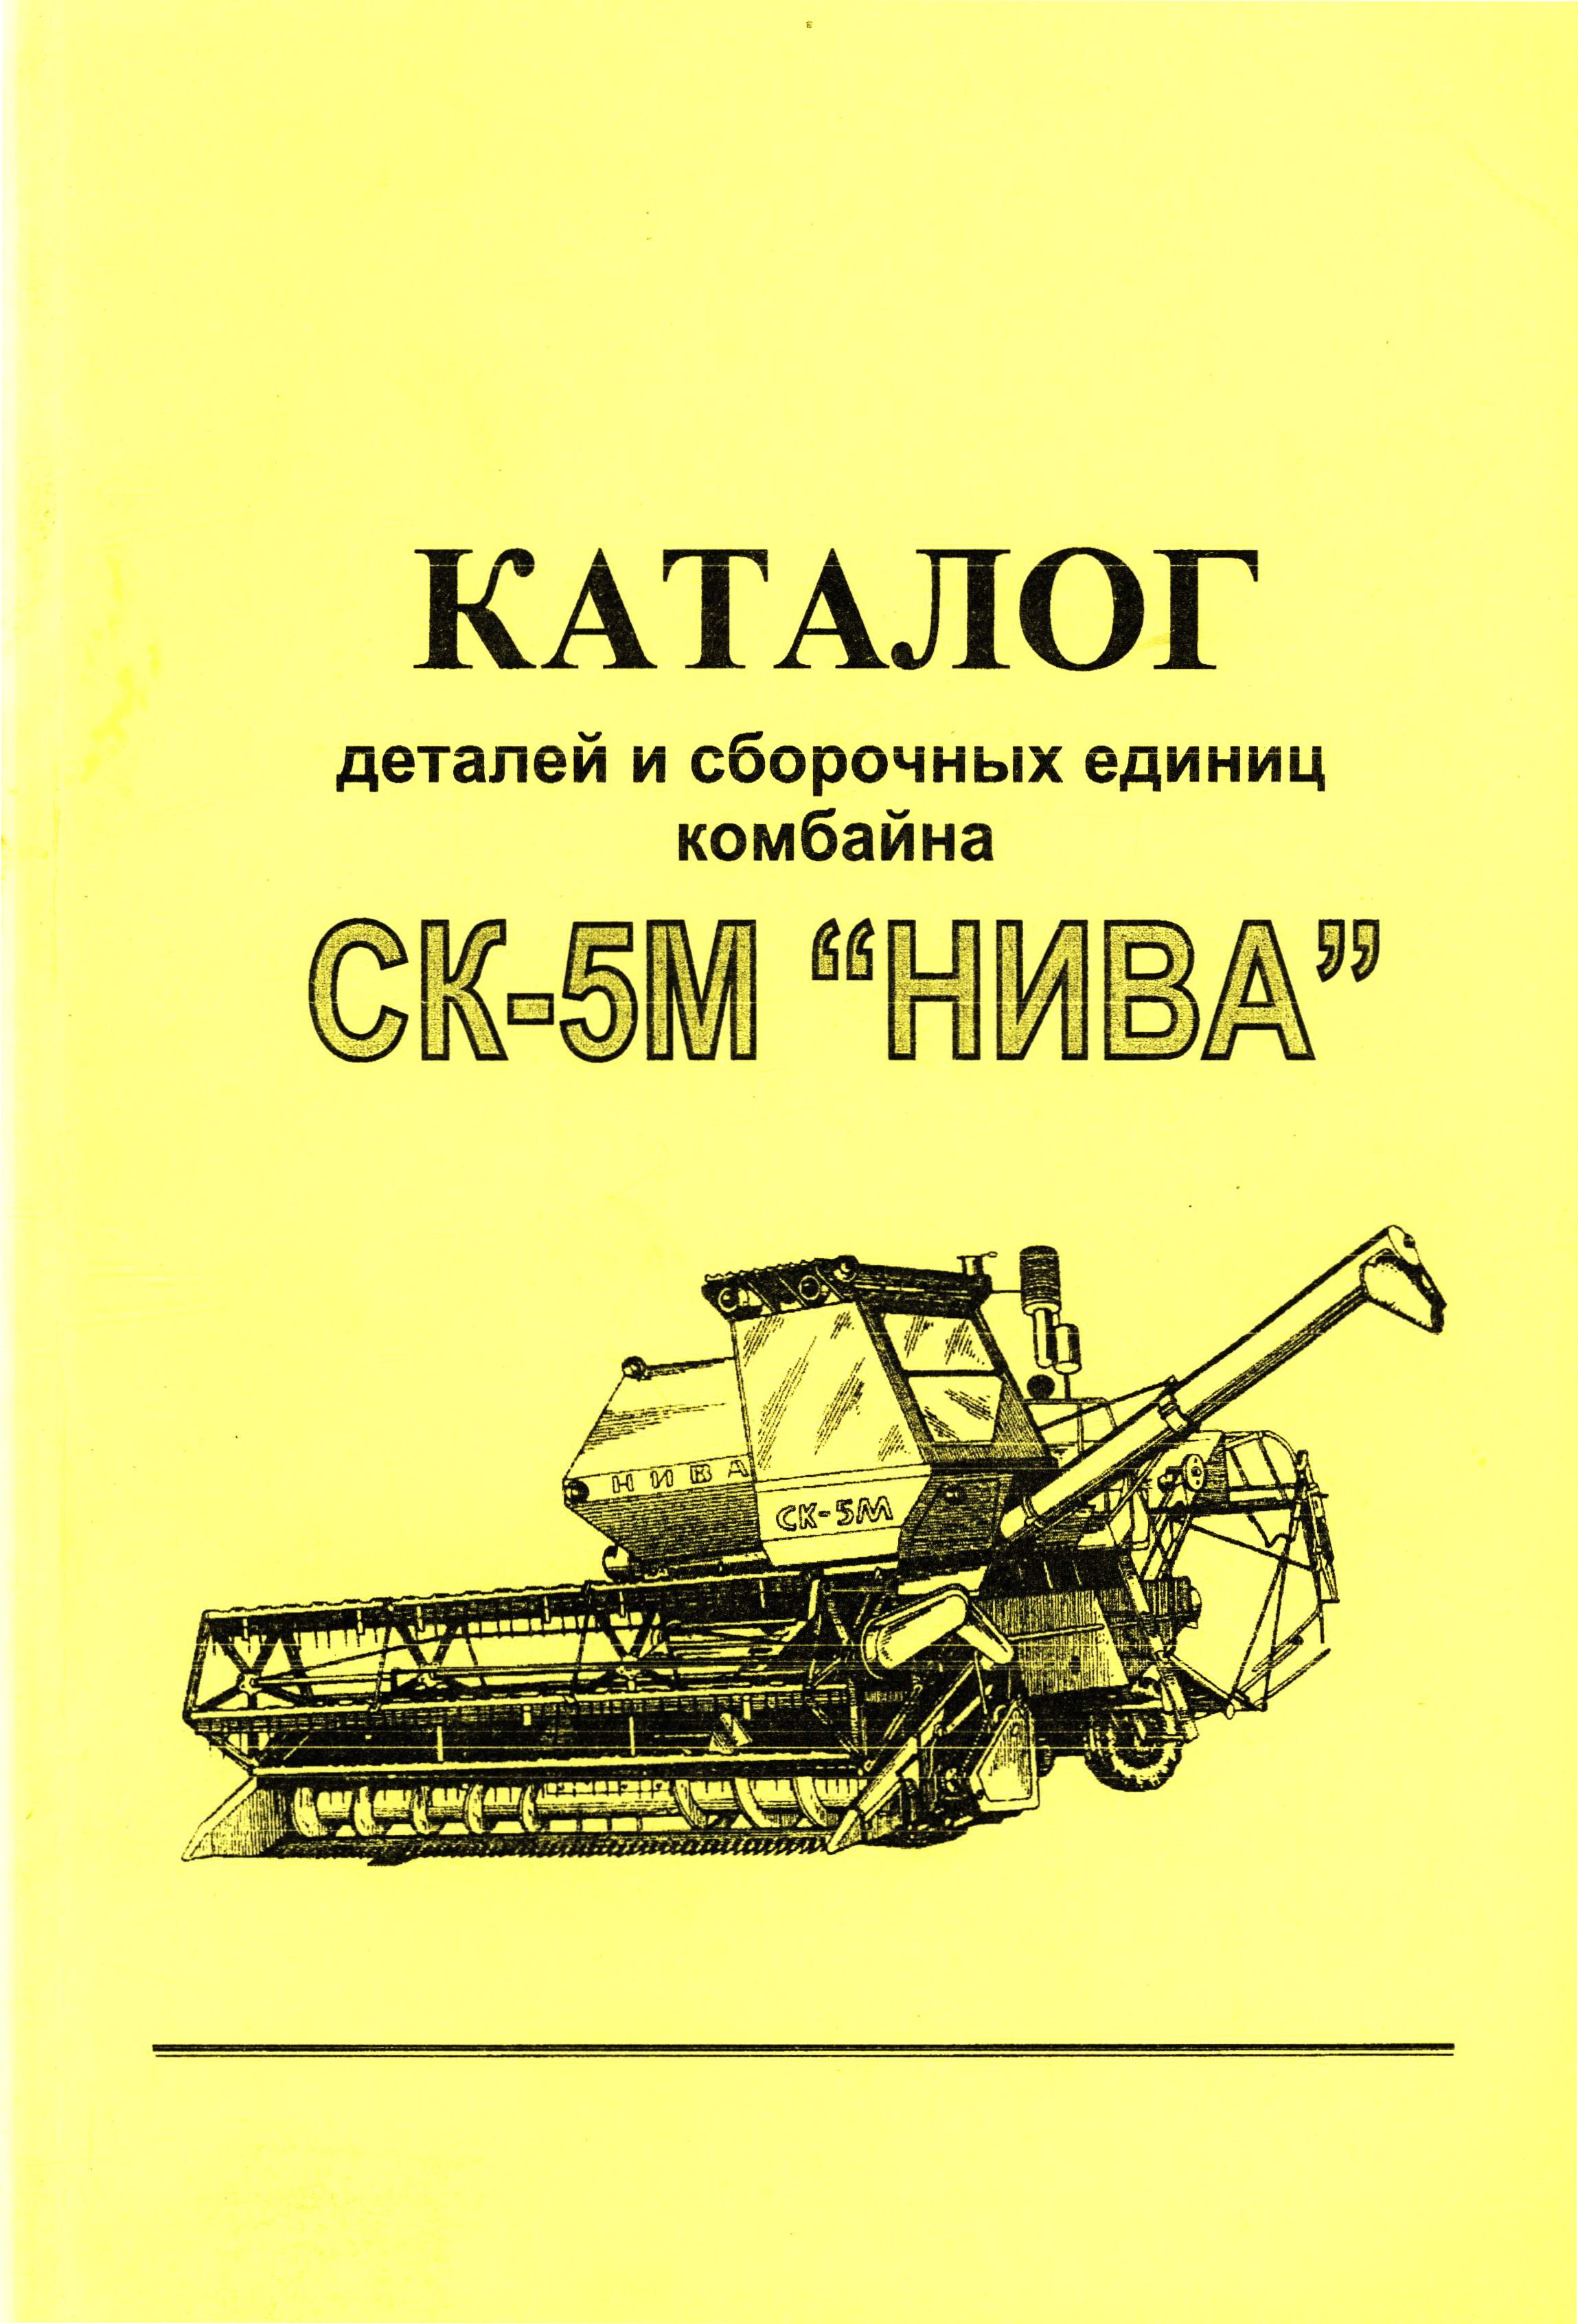 Комбайн Нива (СК 5М). Каталог деталей